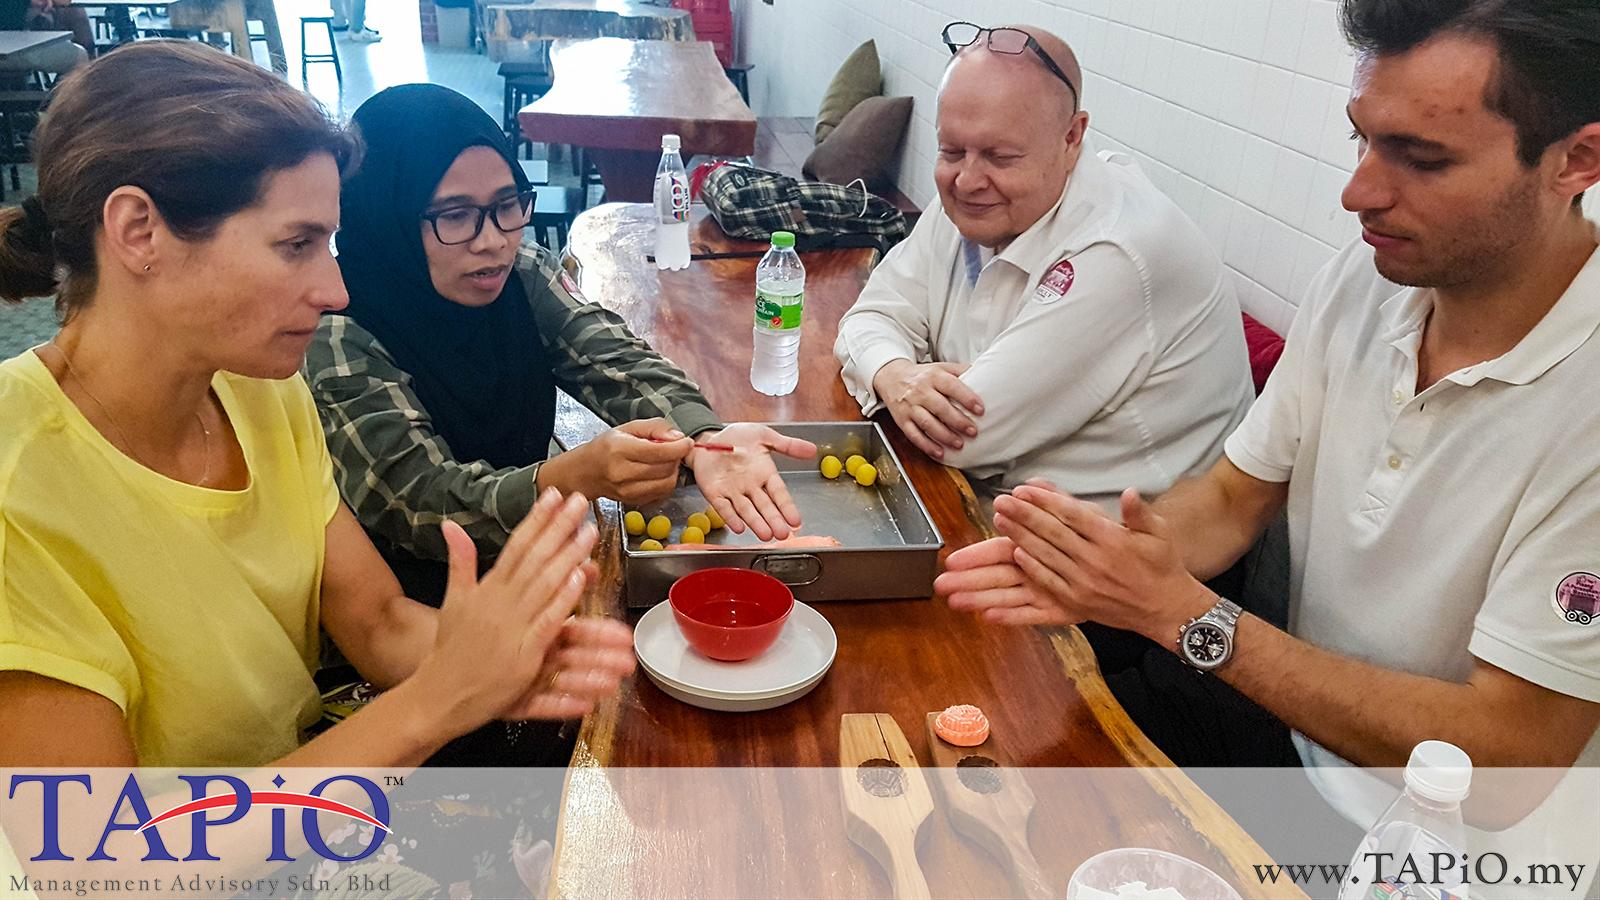 20190714 - Penang Business Trip